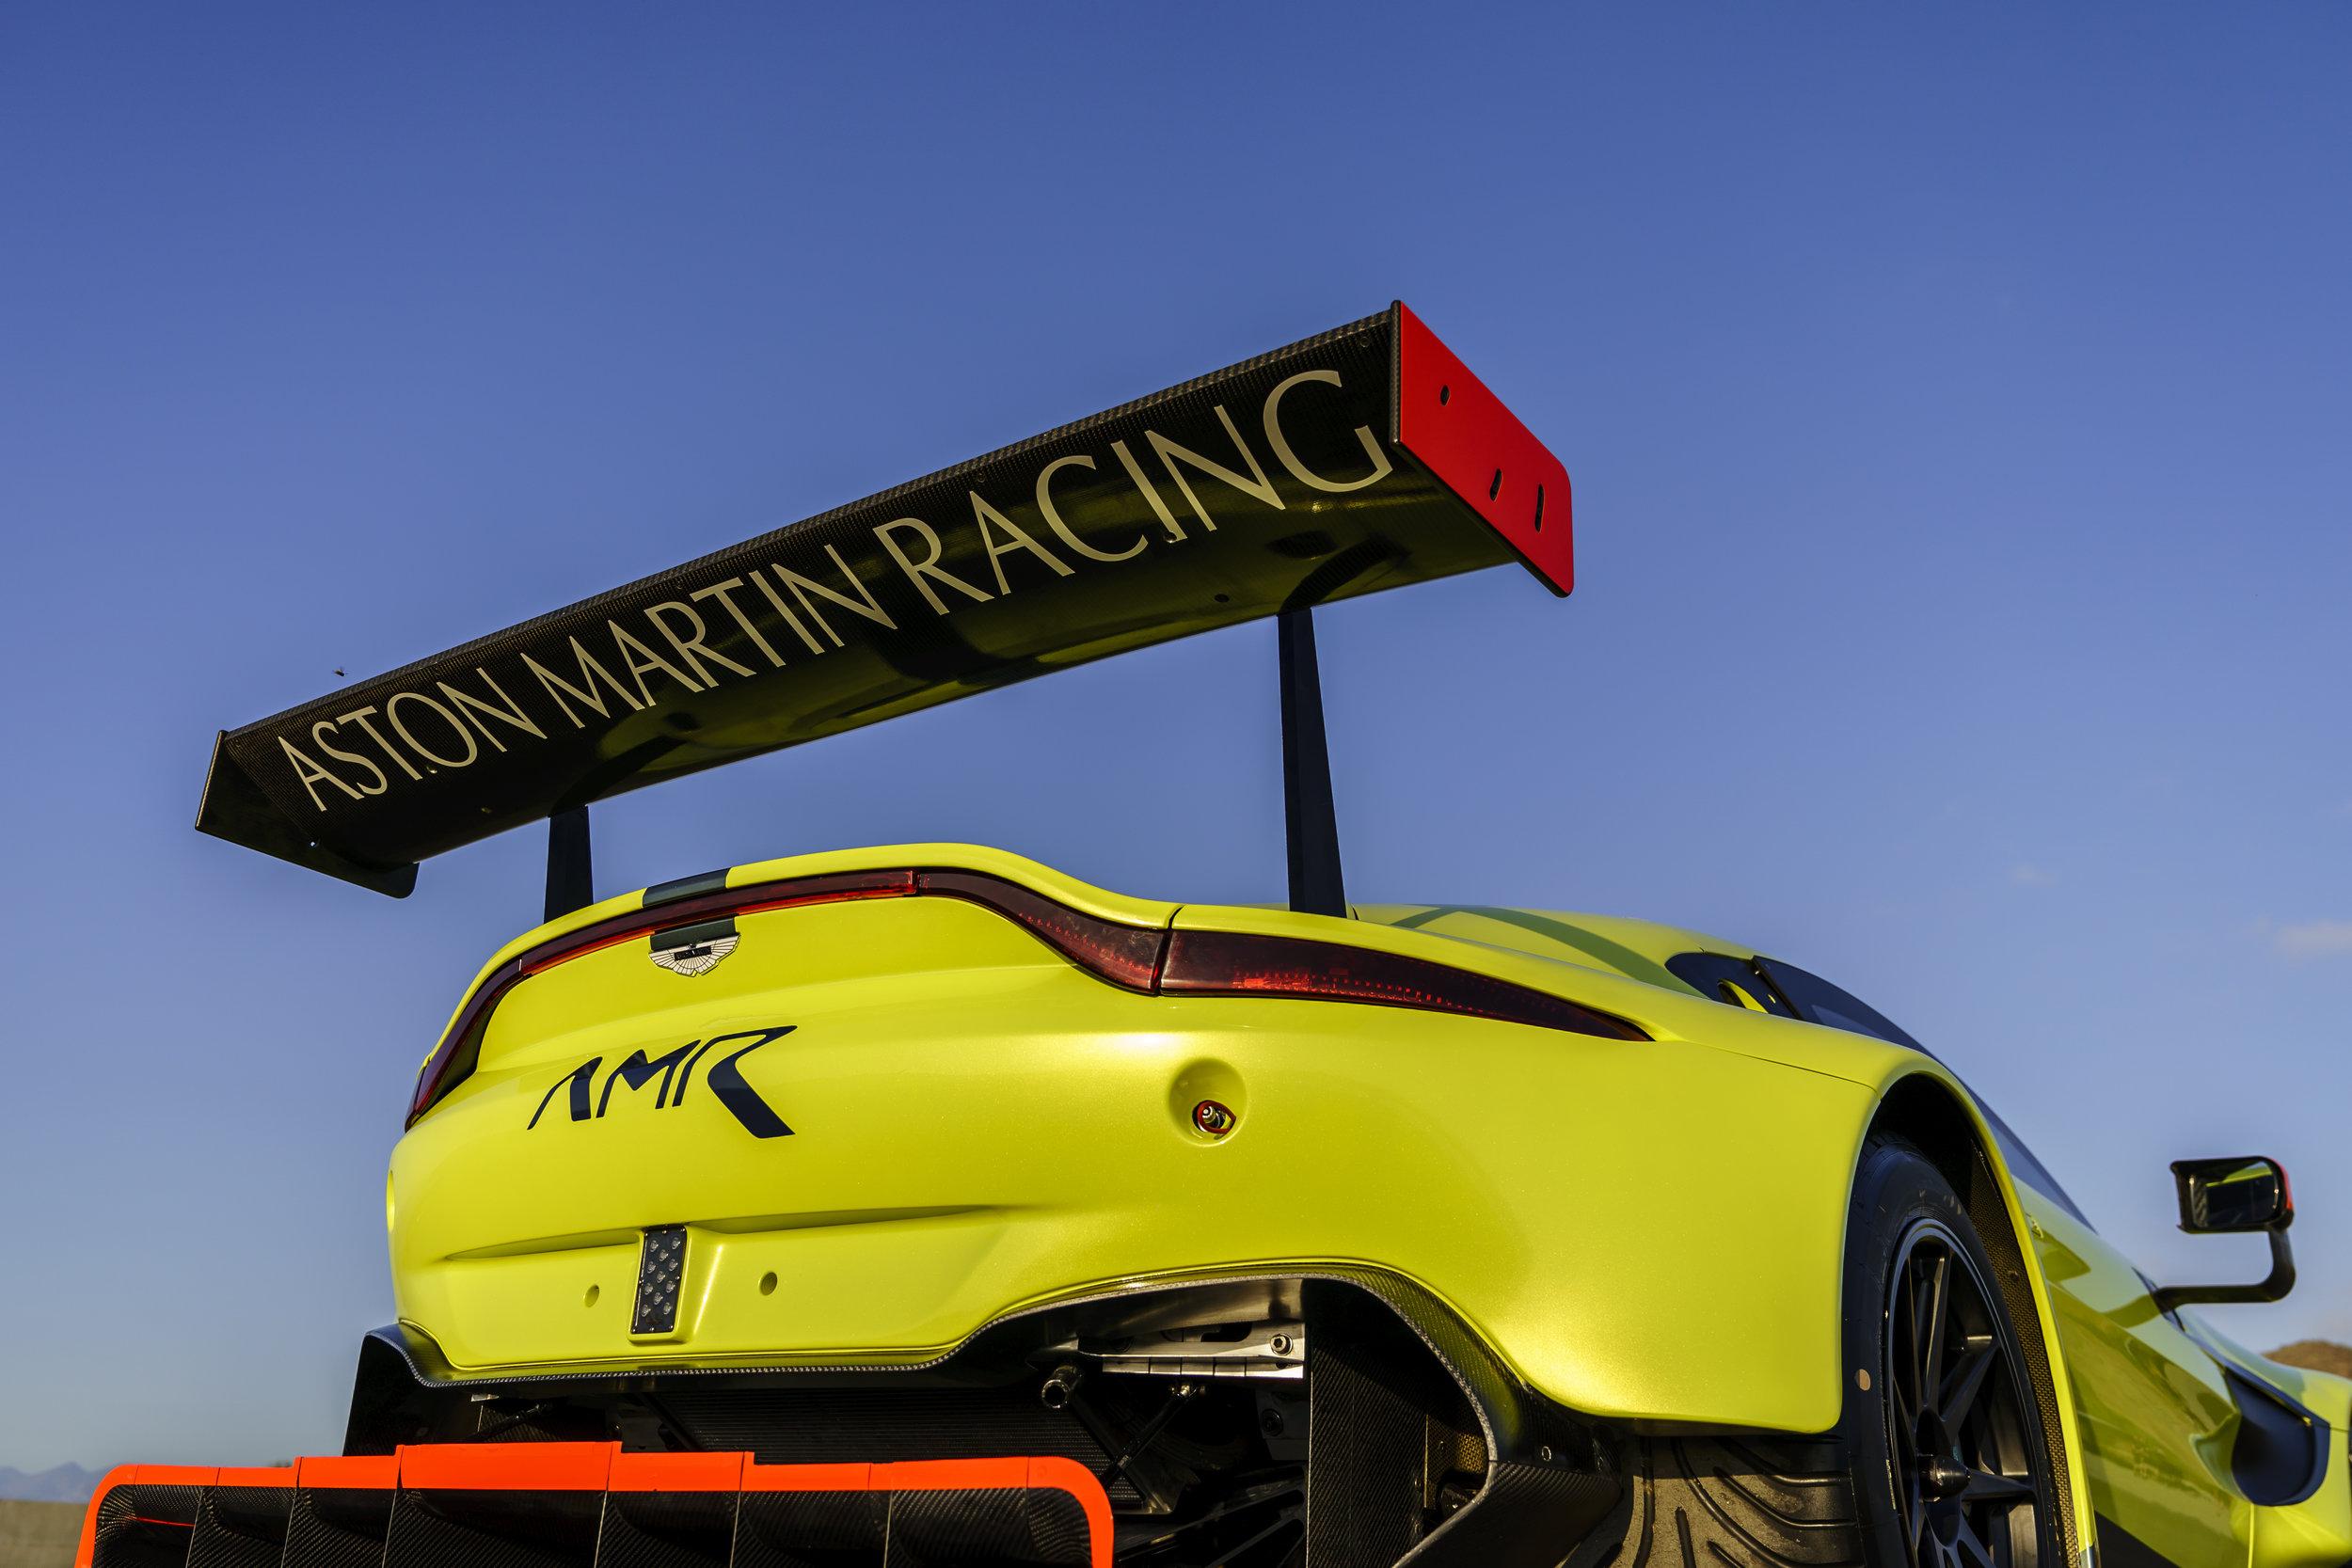 Image Credit: Aston Martin